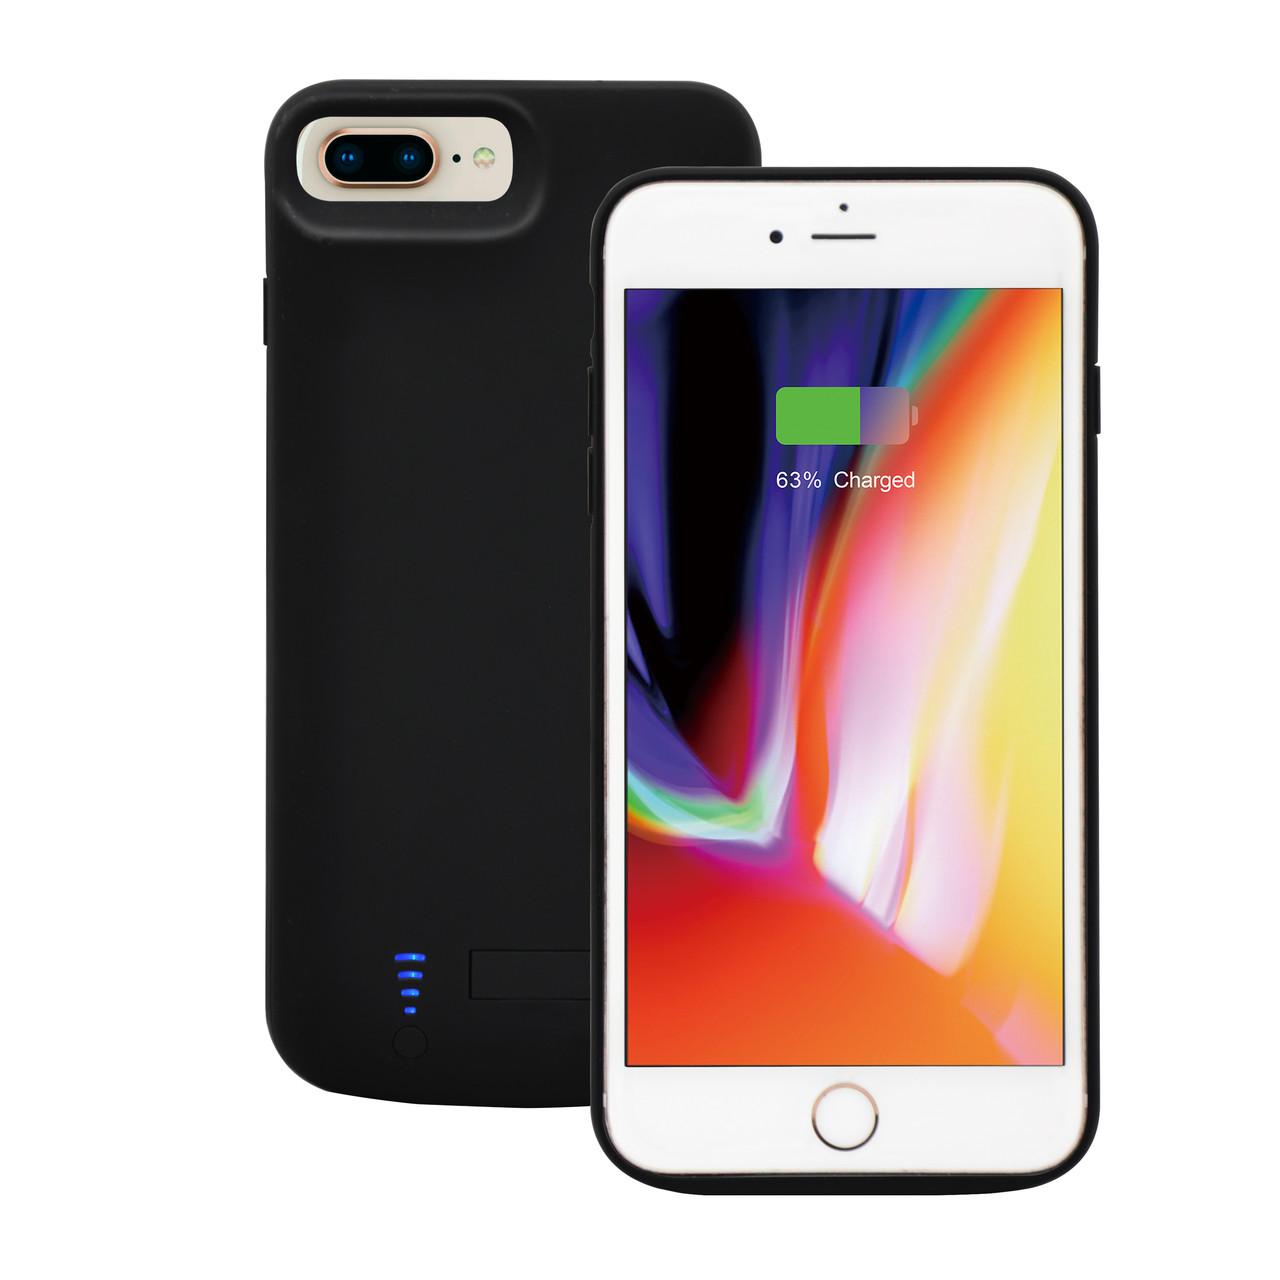 Чехол-аккумулятор XON PowerCase для iPhone 6 Plus/6S Plus/7 Plus/8 Plus 8000 mAh Black